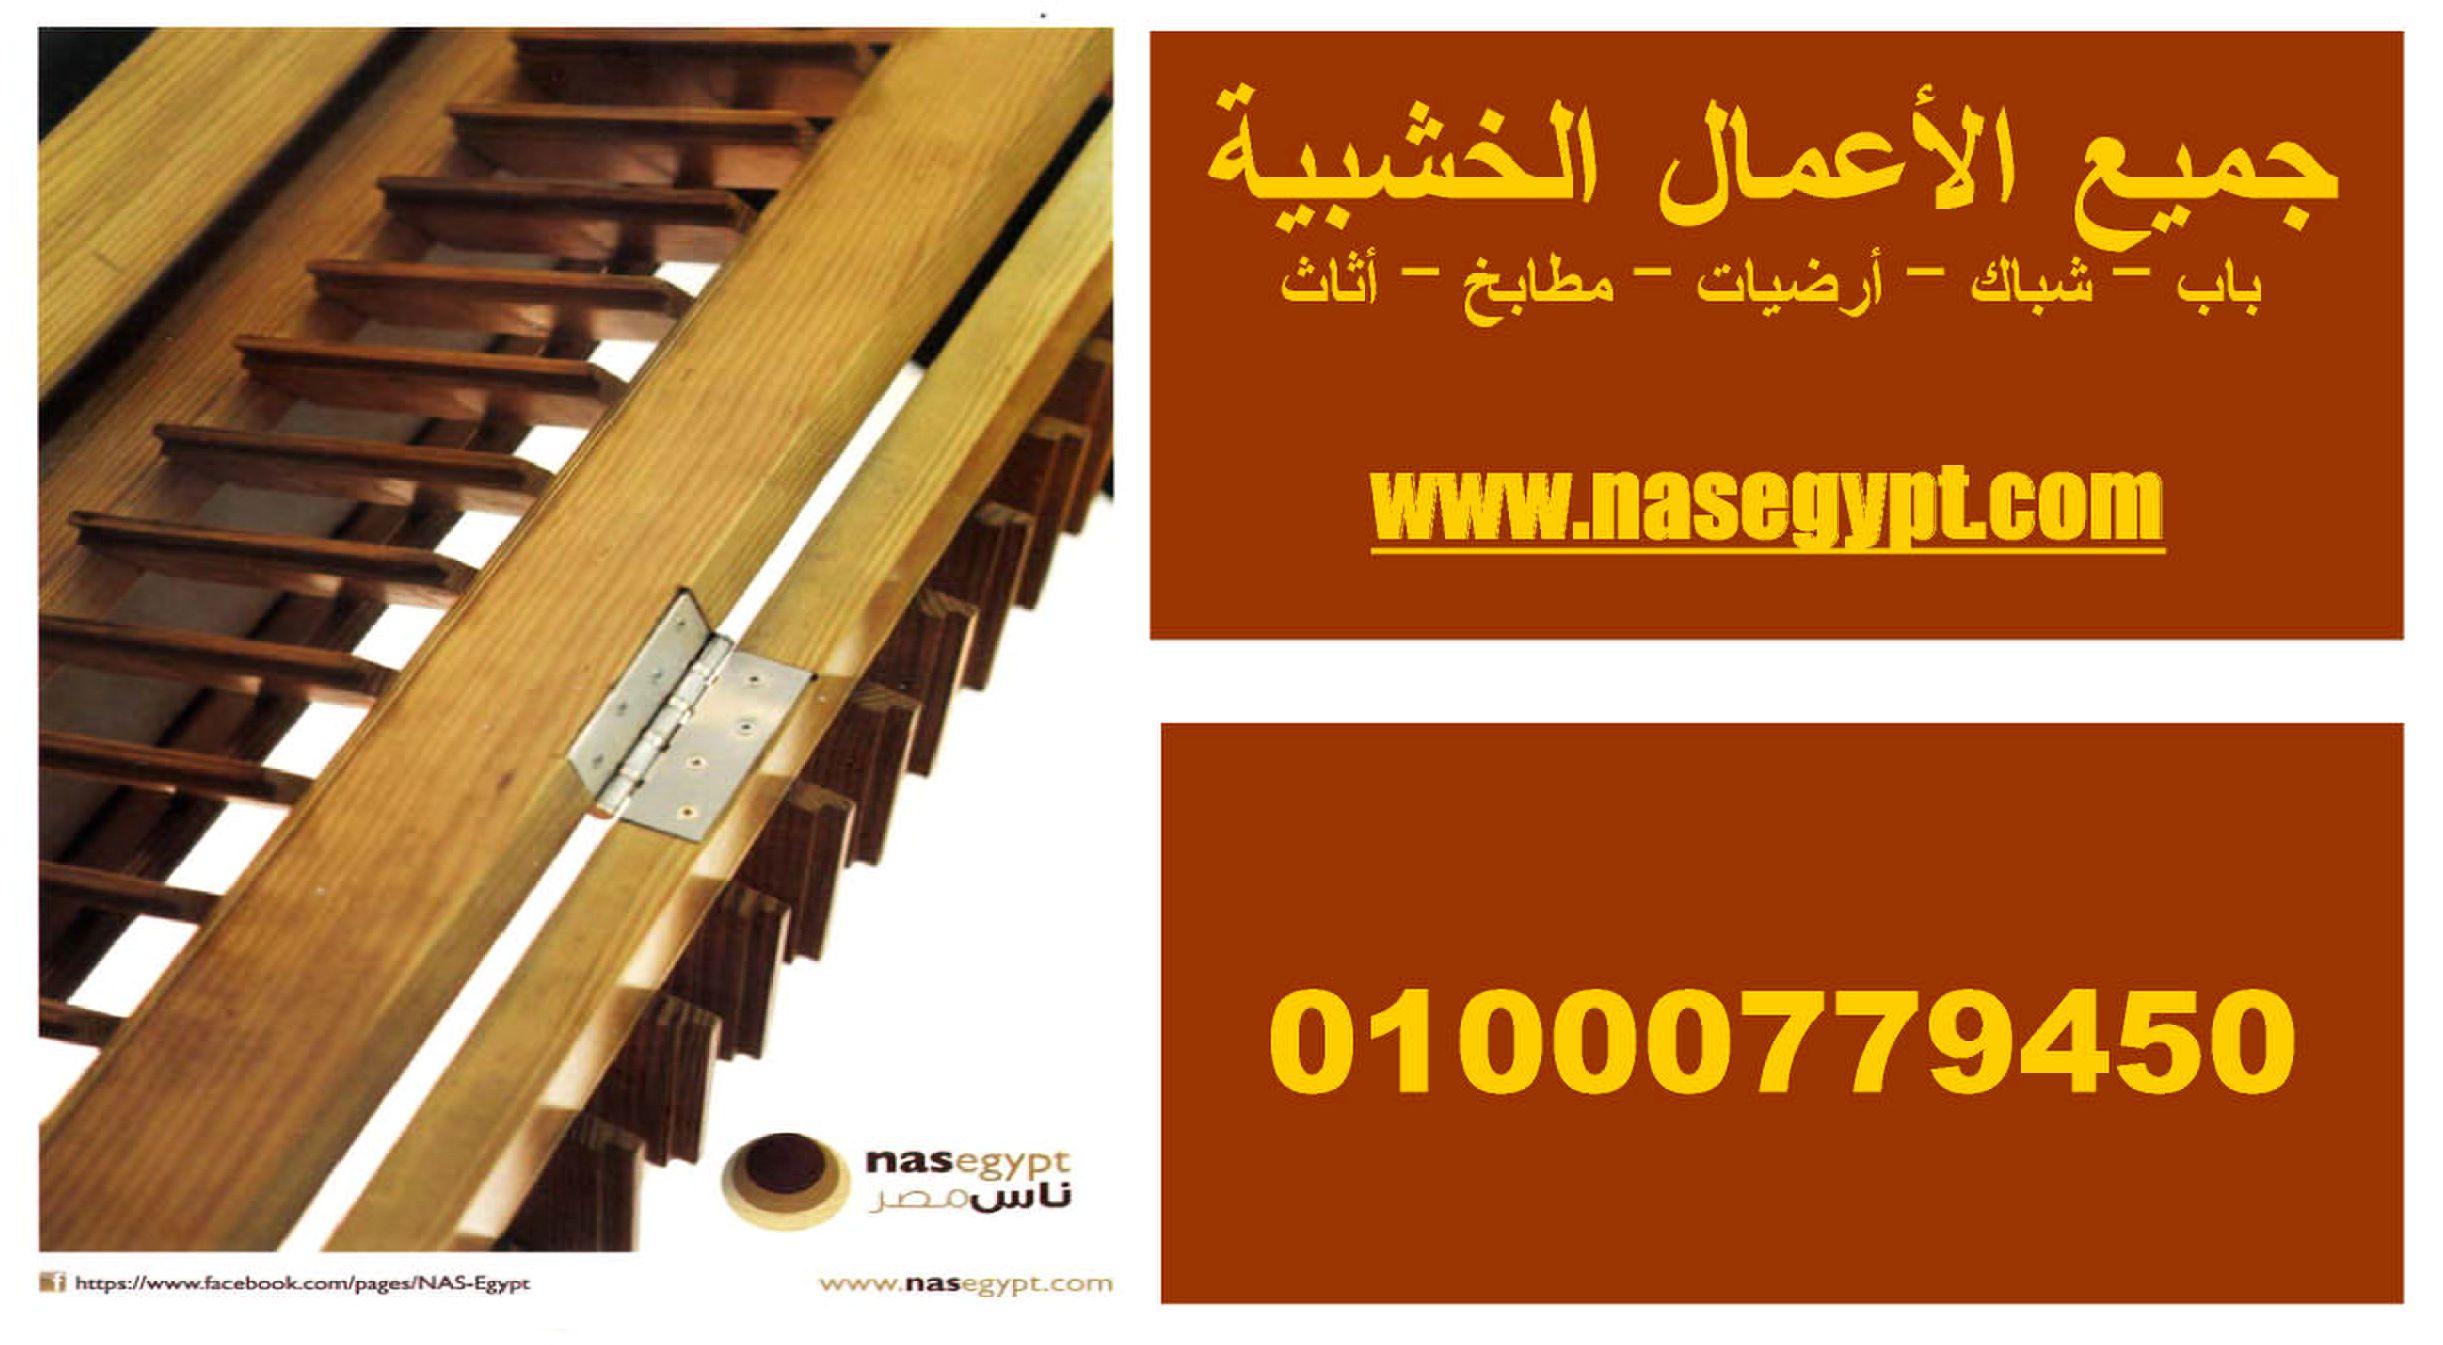 www.nasegypt.com